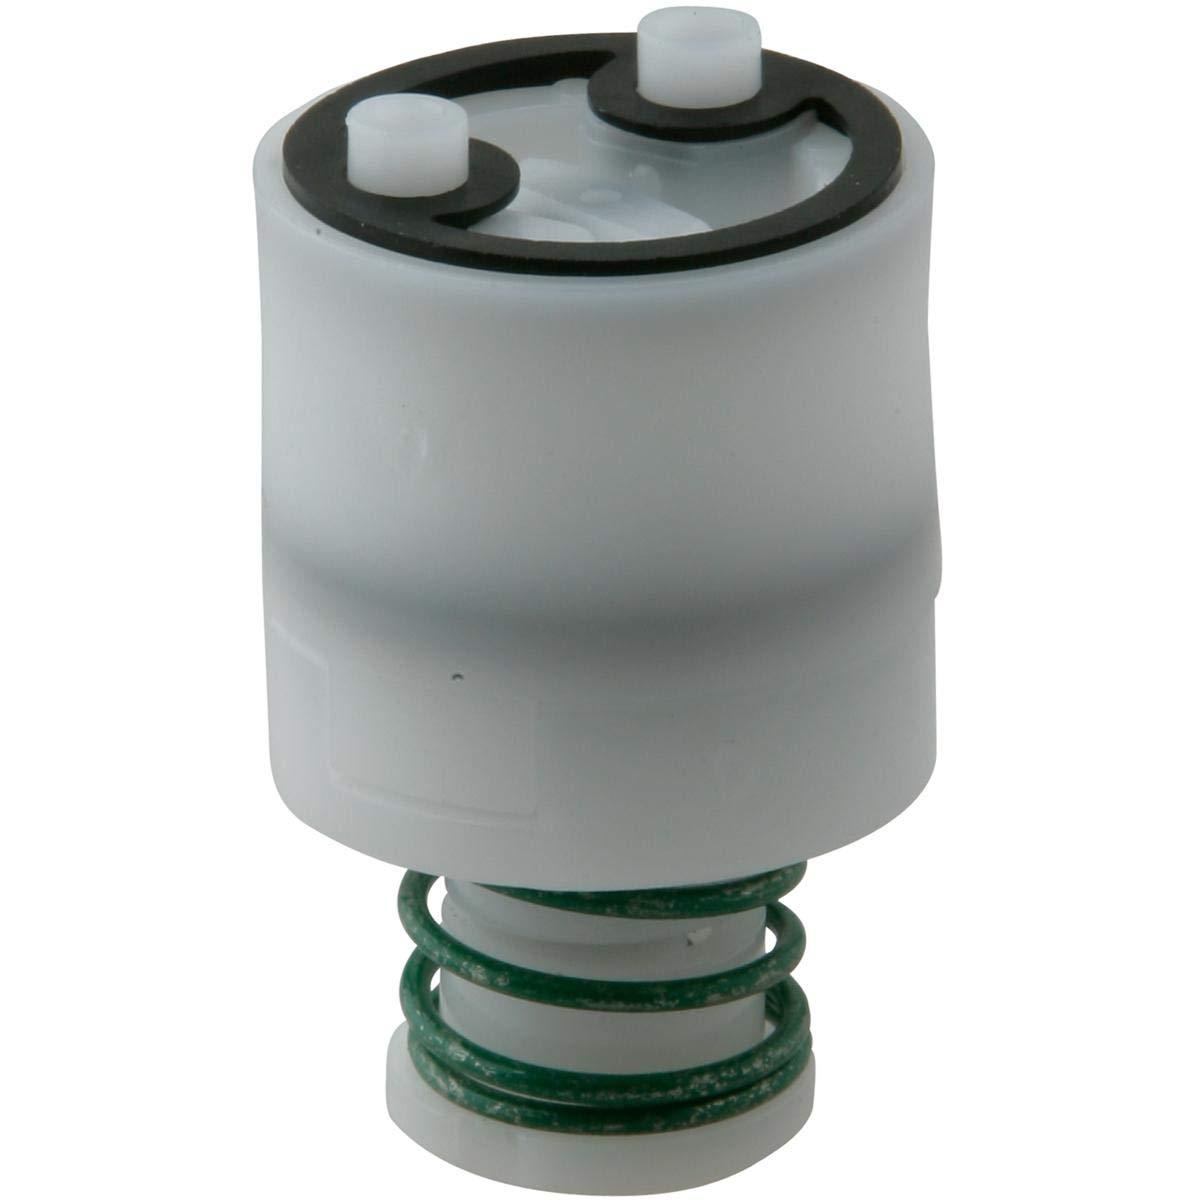 Elkay 61314C Regulator - With Green Spring